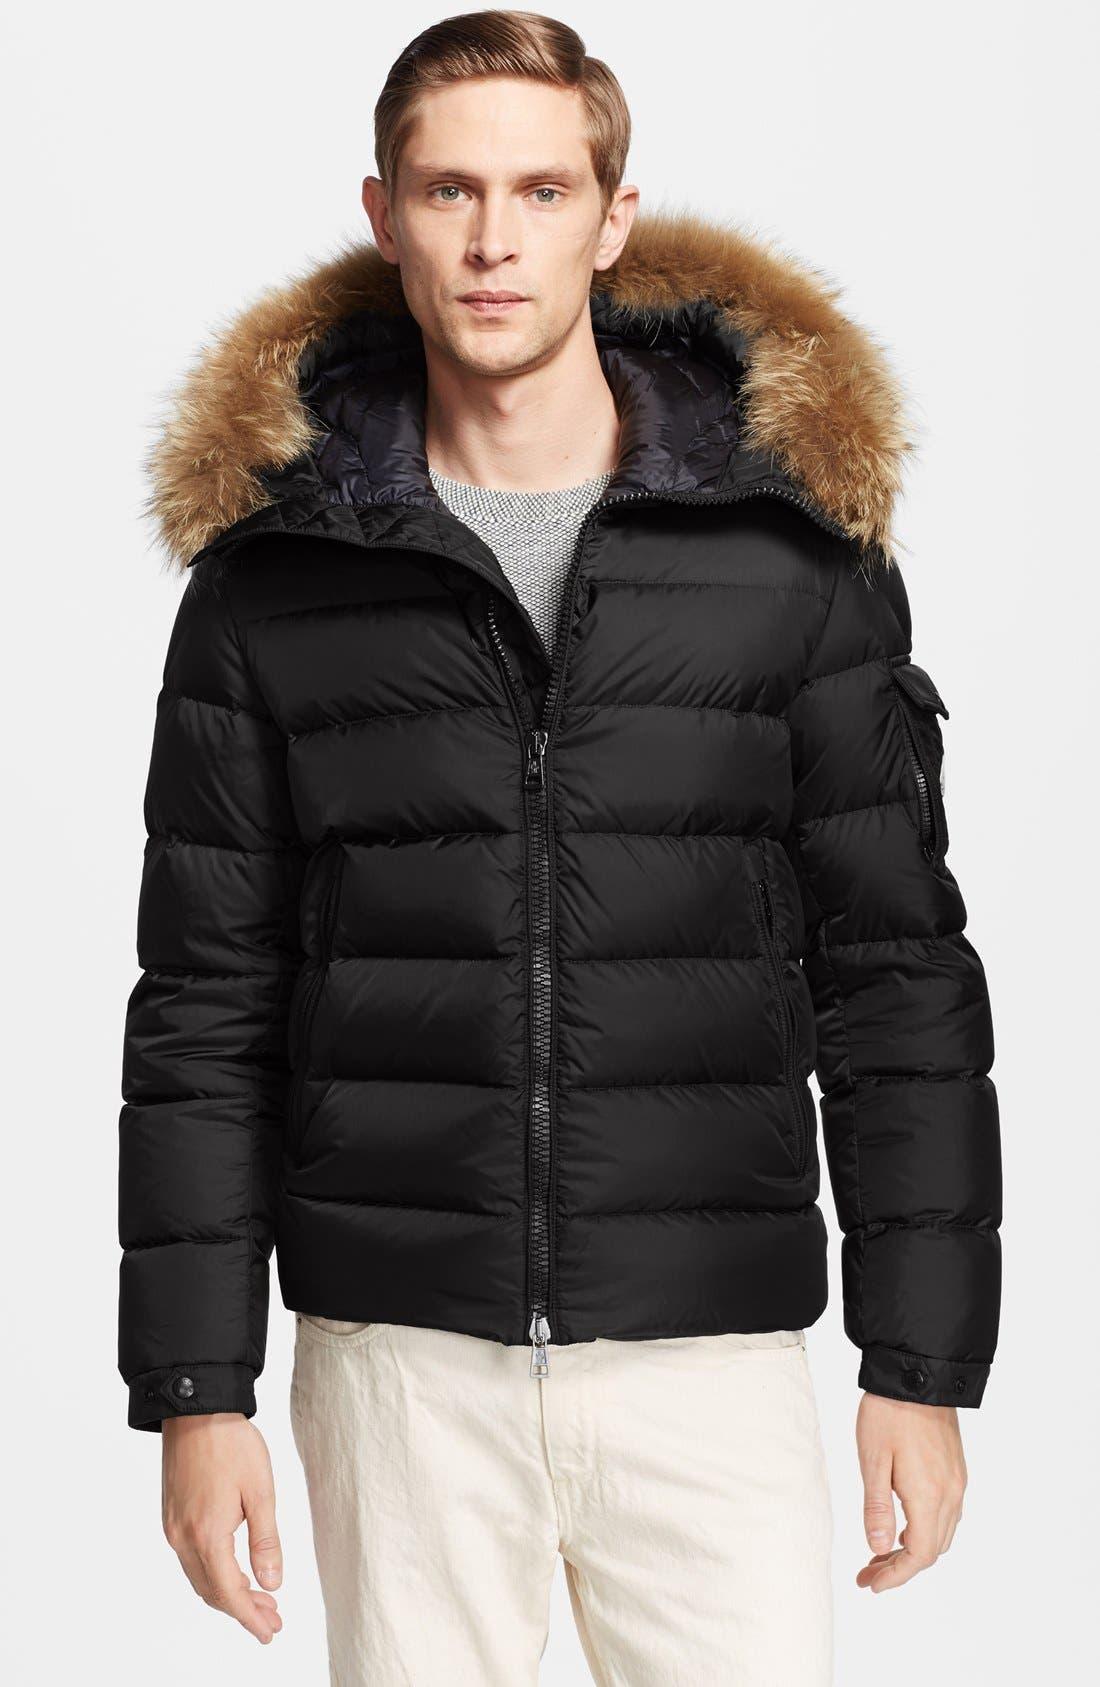 Alternate Image 1 Selected - Moncler 'Byron' Down Jacket with Fur Trimmed Hood